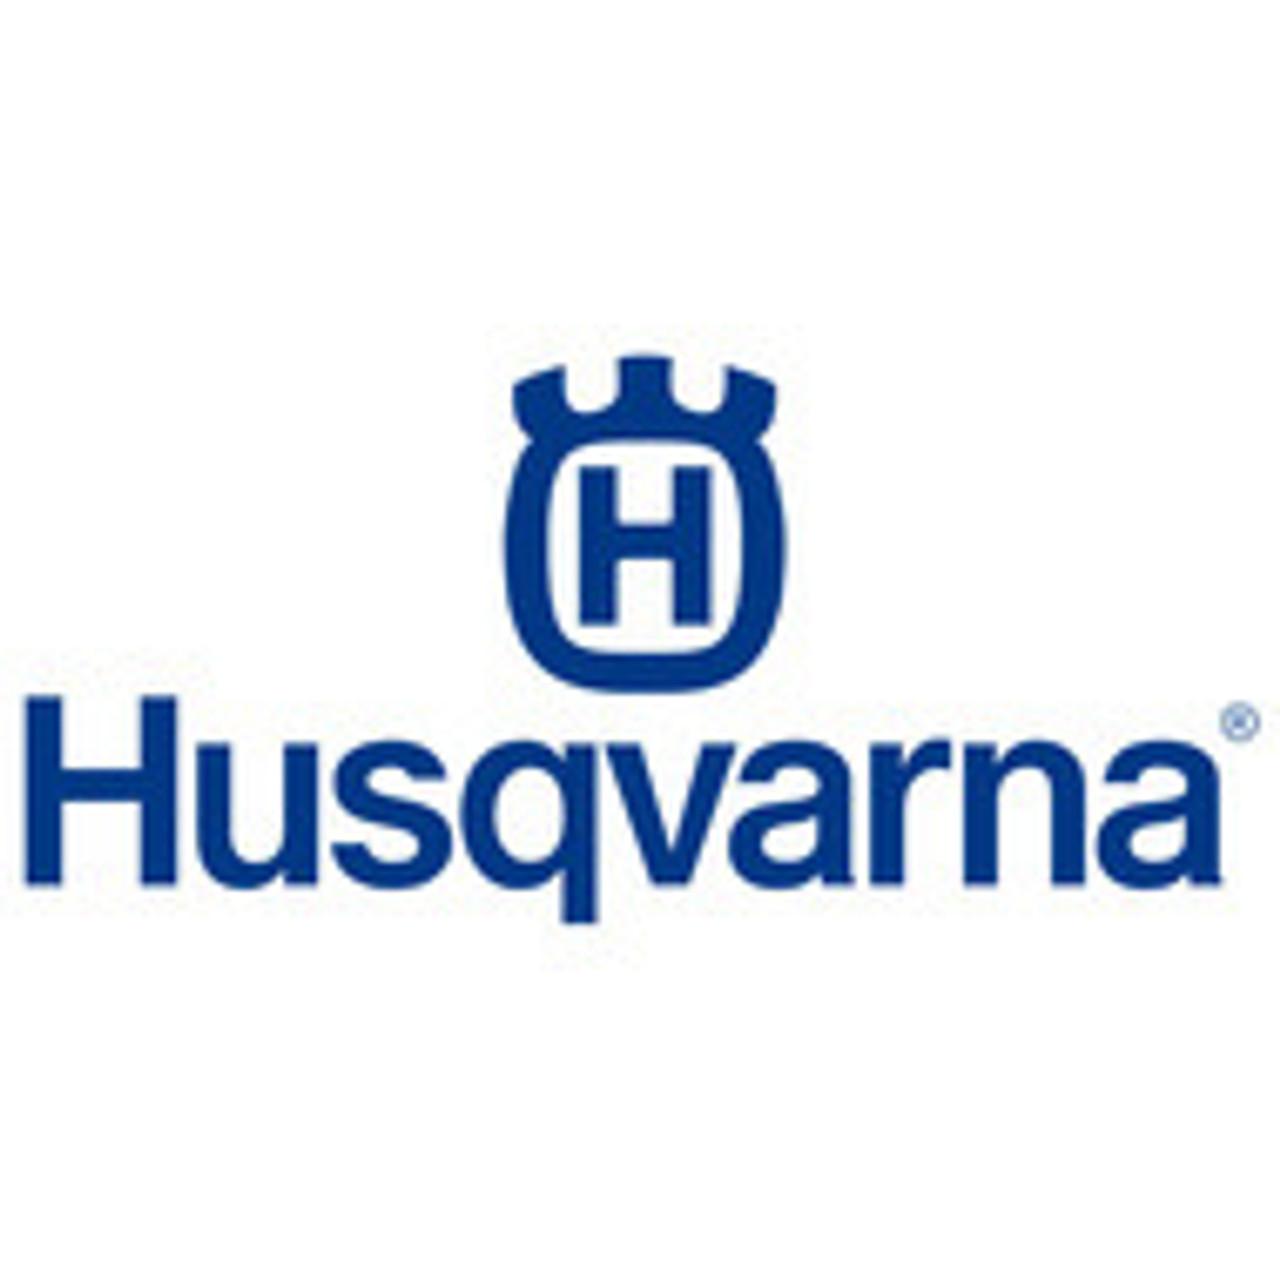 Husqvarna 5321696-99 DEFLECTOR.21.MCUT.RWGD.GRAY